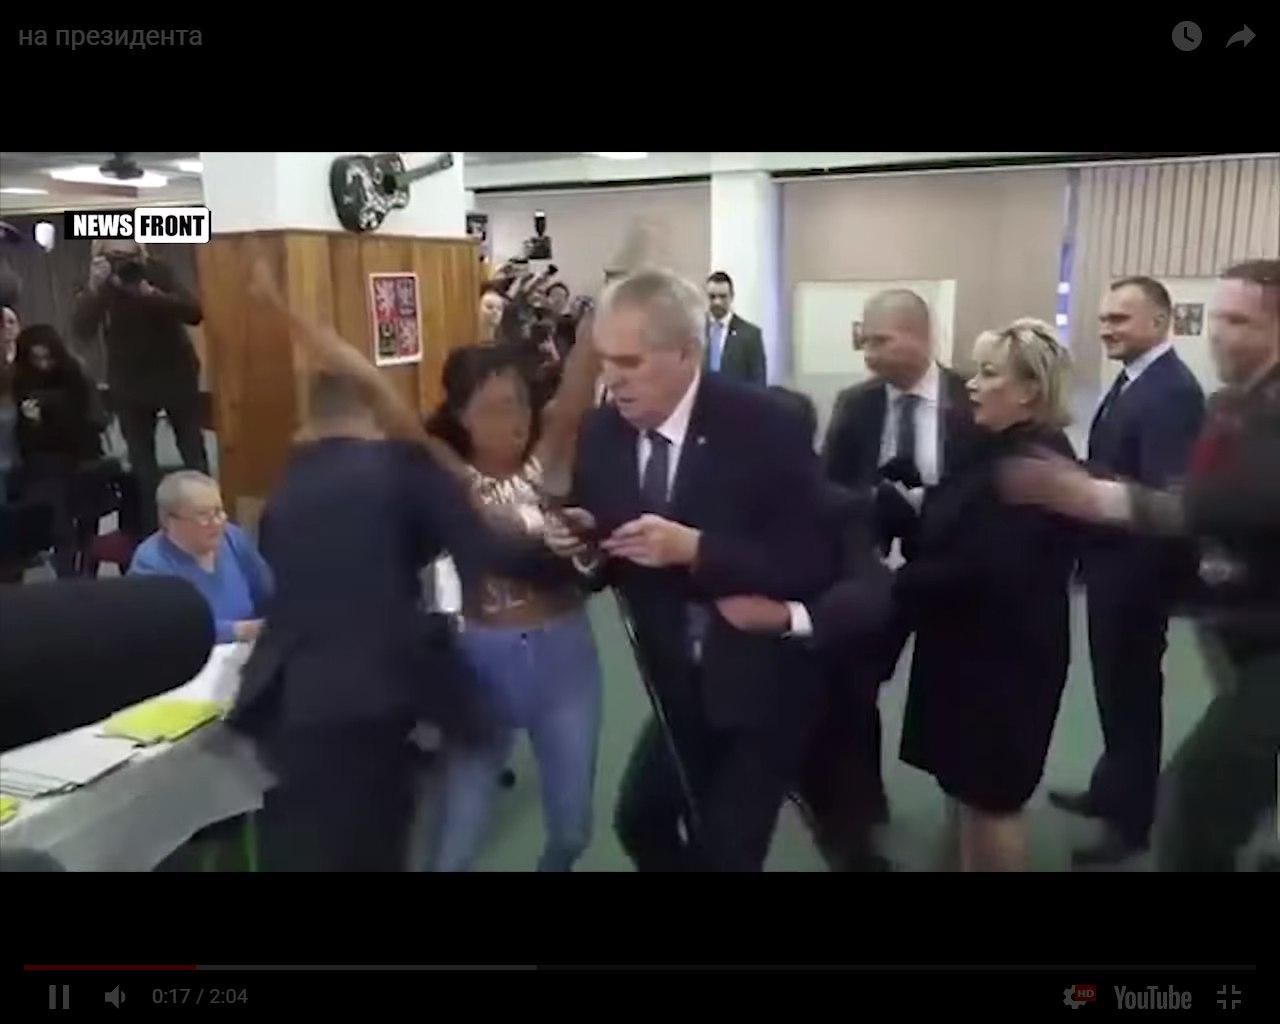 Полуголая украинка напала на президента Чехии